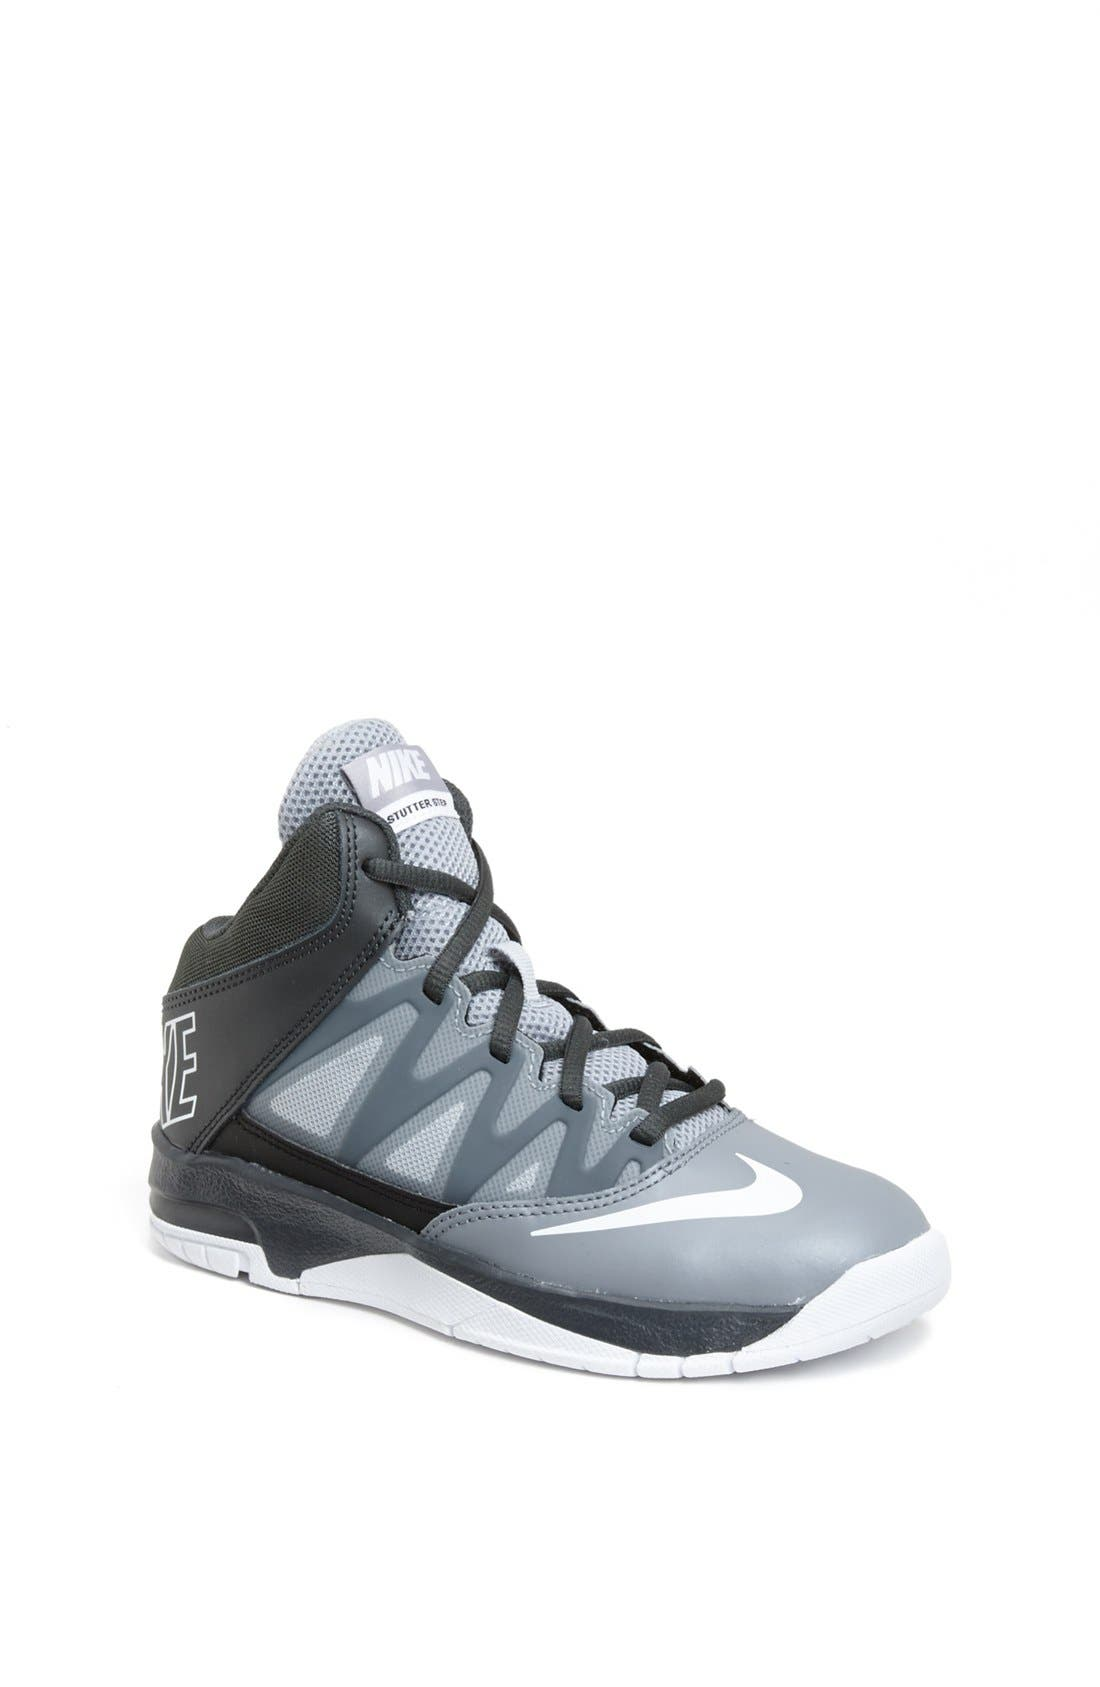 Main Image - Nike 'Stutter Step' Basketball Shoe (Toddler & Little Kid)